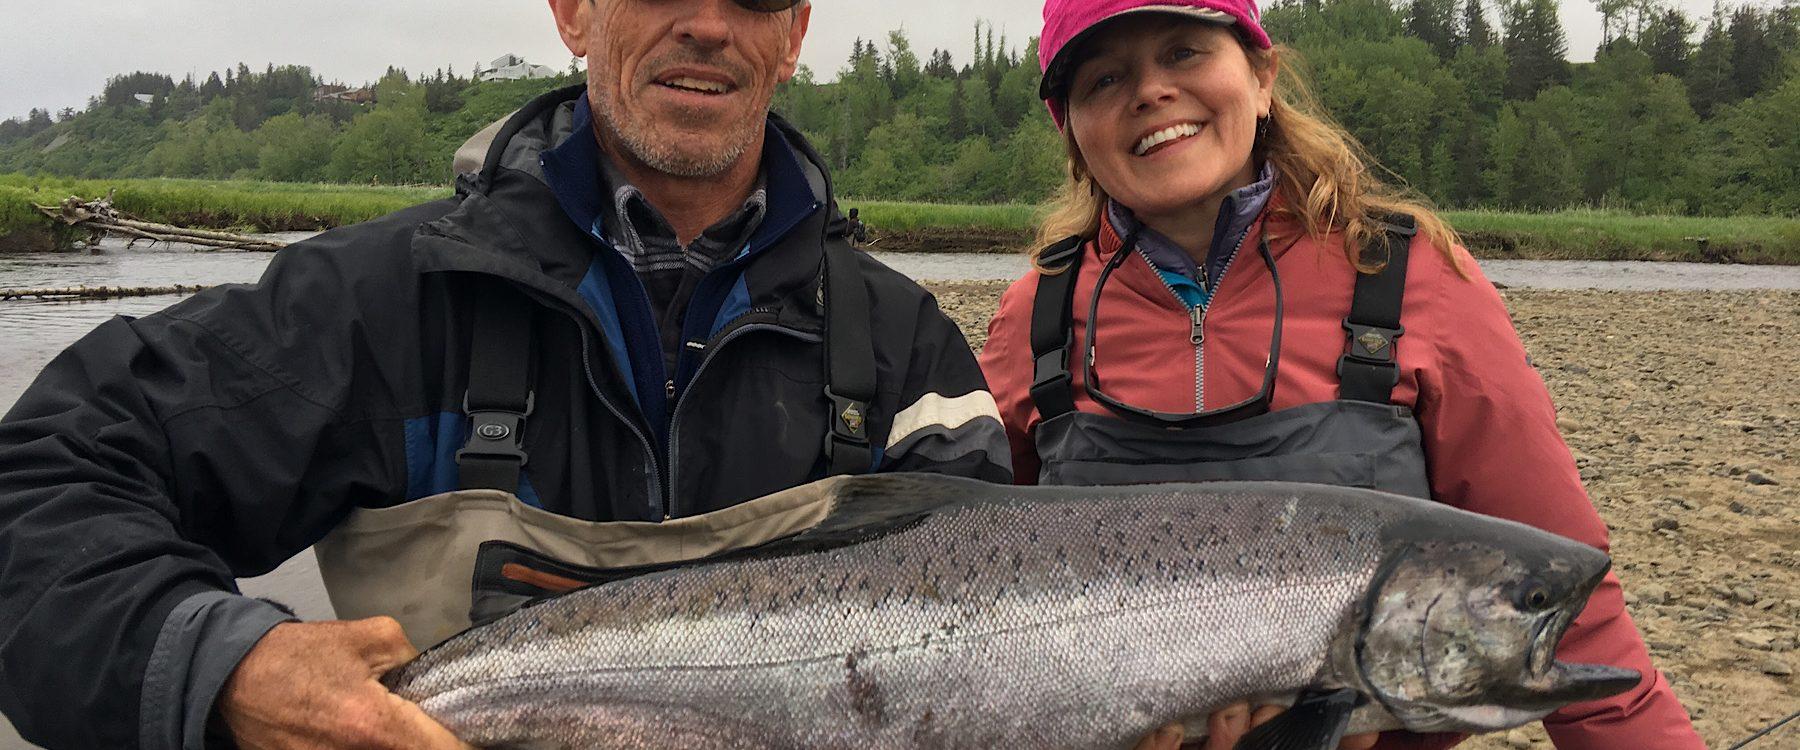 Alaska Legacy's Kenai Fishing Guides